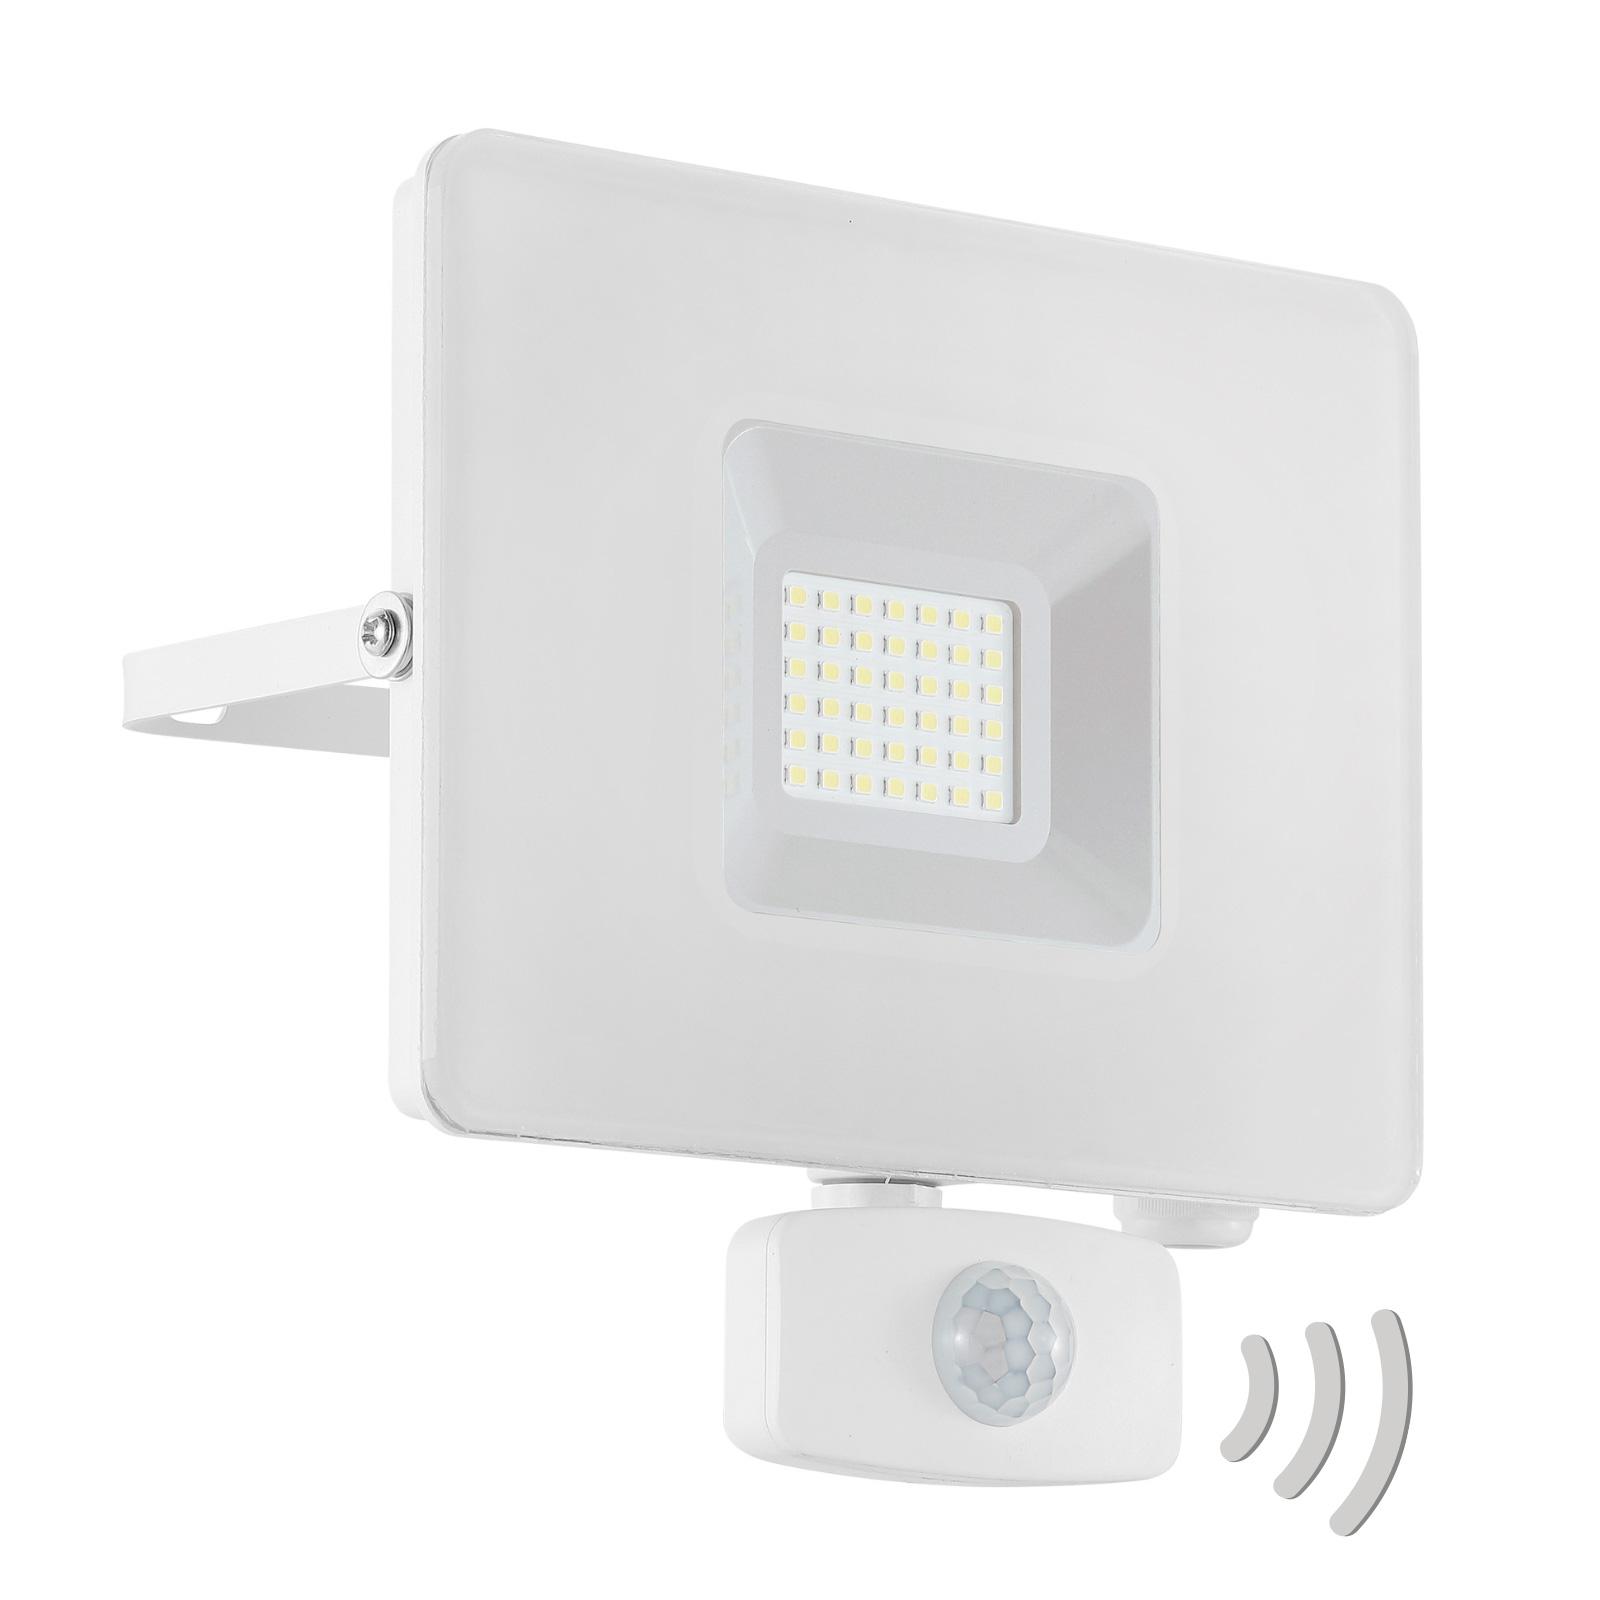 LED buitenspot Faedo 3 met sensor, wit, 30W